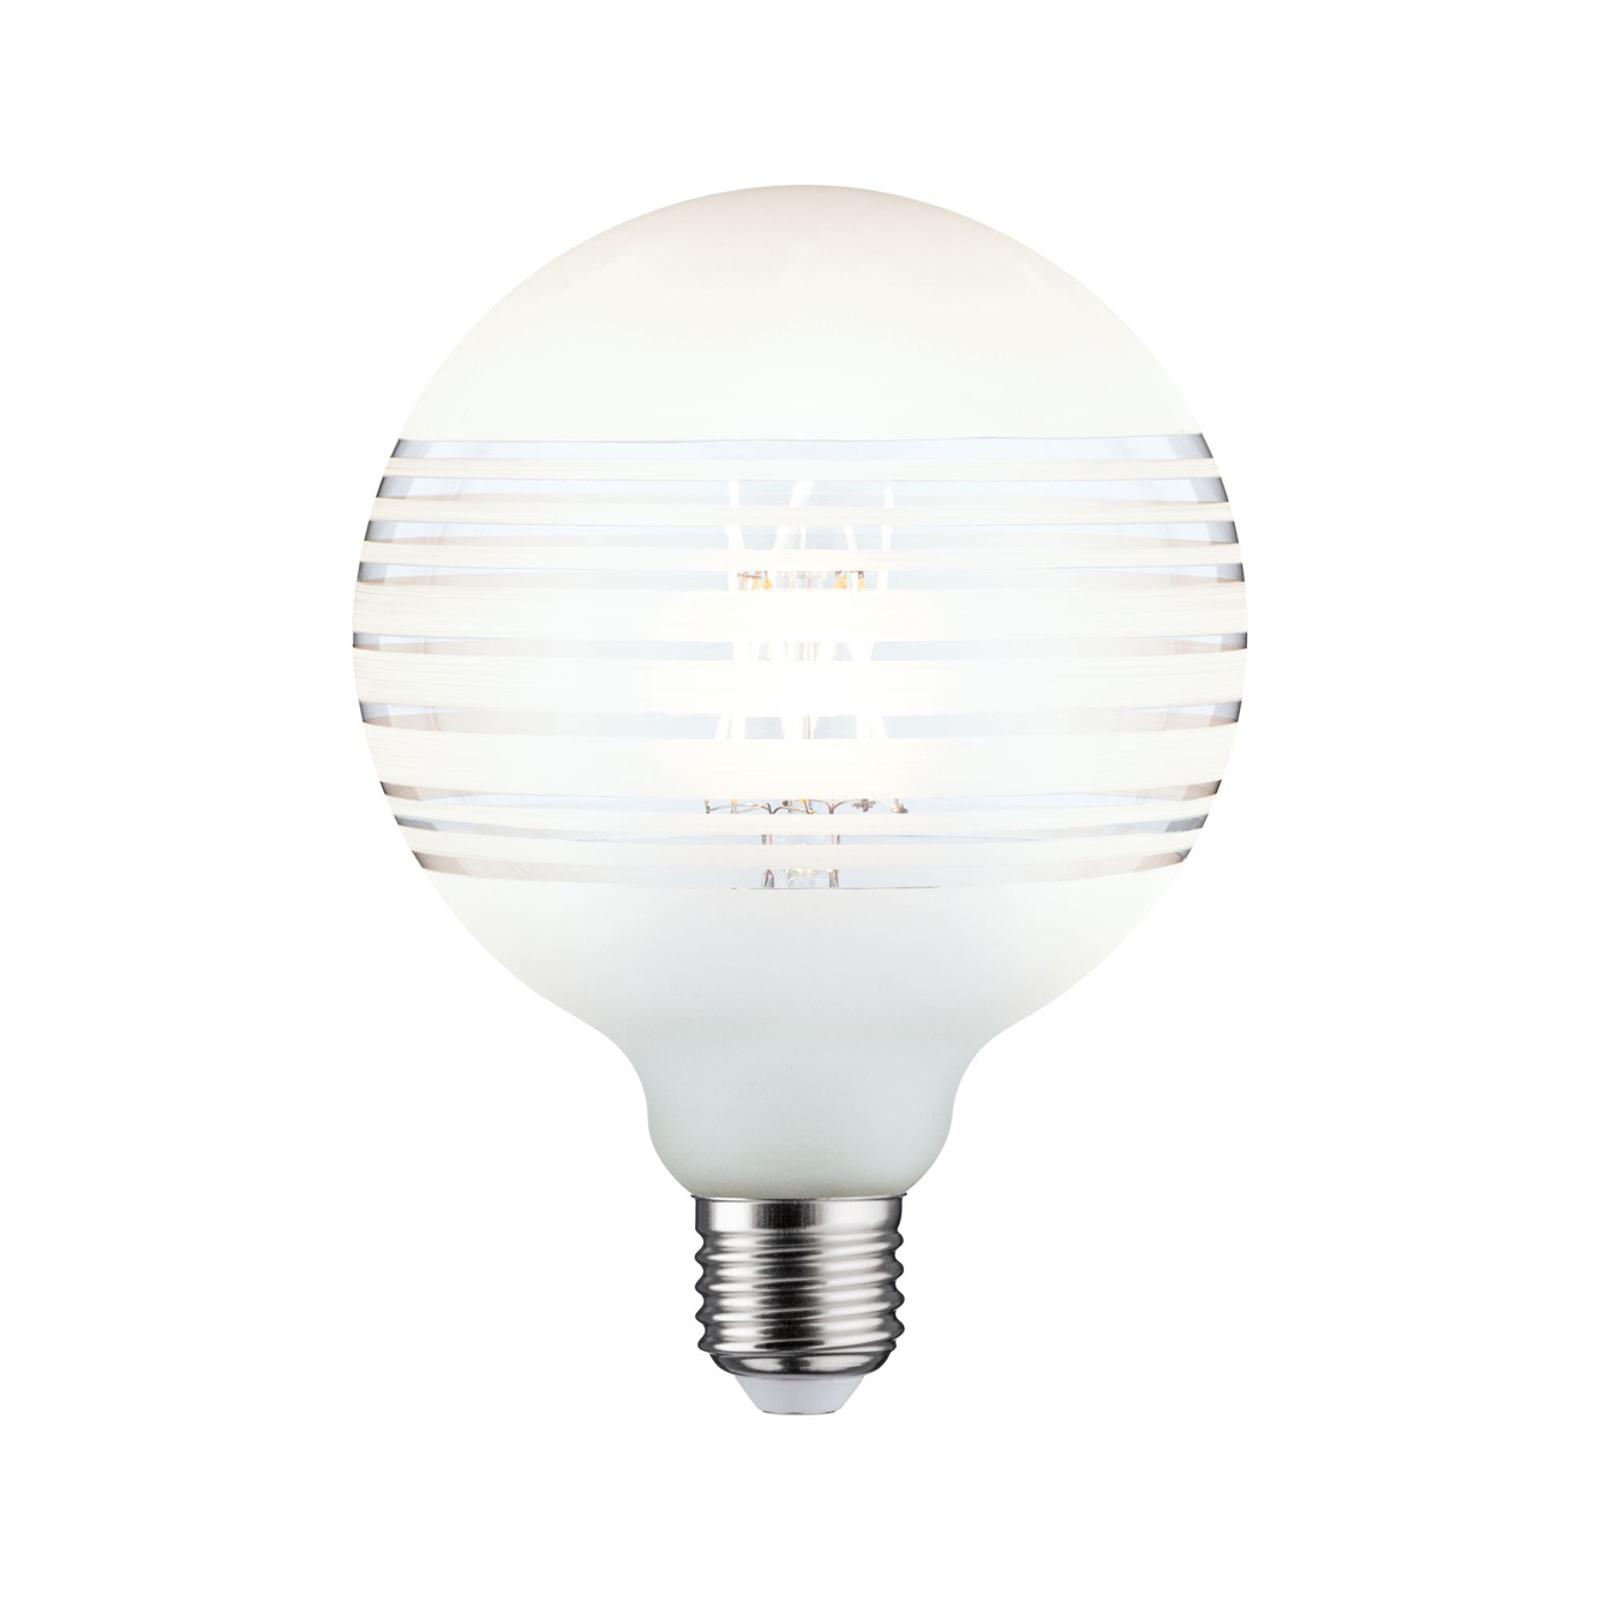 Paulmann E27 żarówka globe LED 4,5W lustro linia